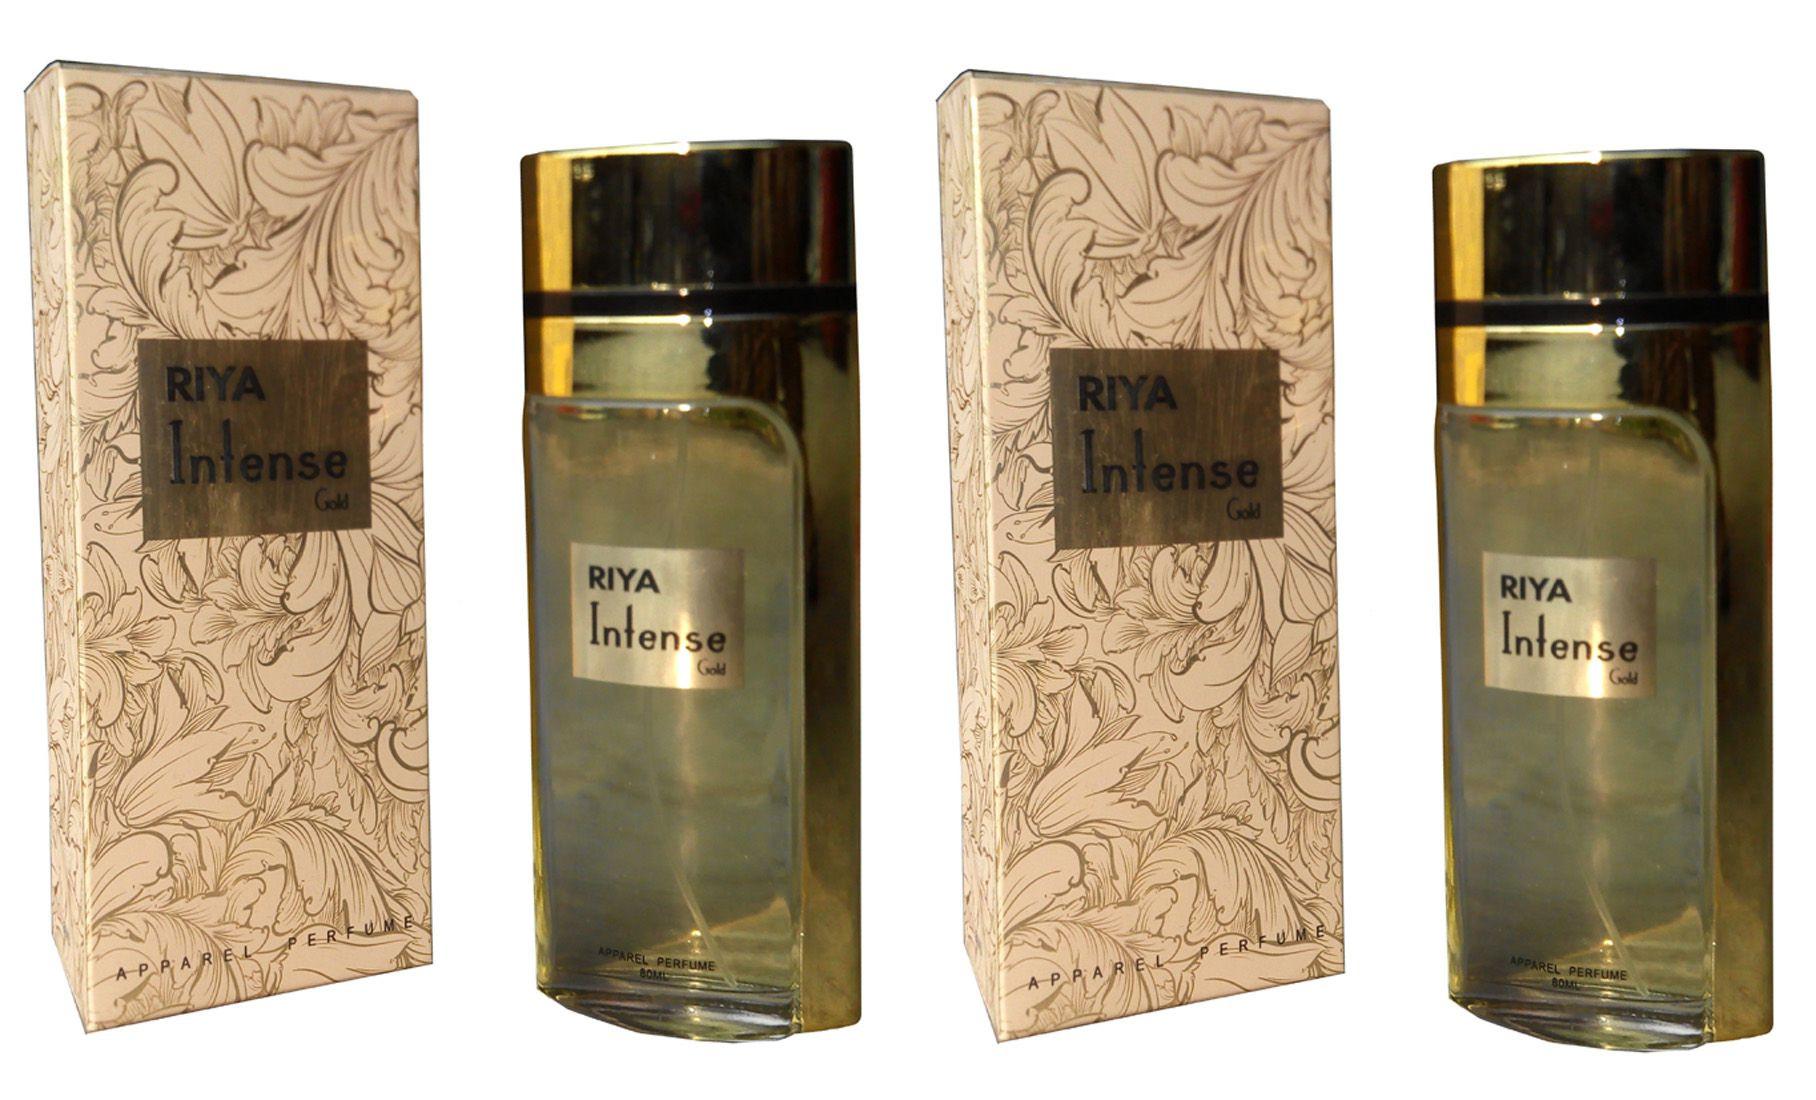 Riya intese gold Perfume for uni bo of 2 100 ml